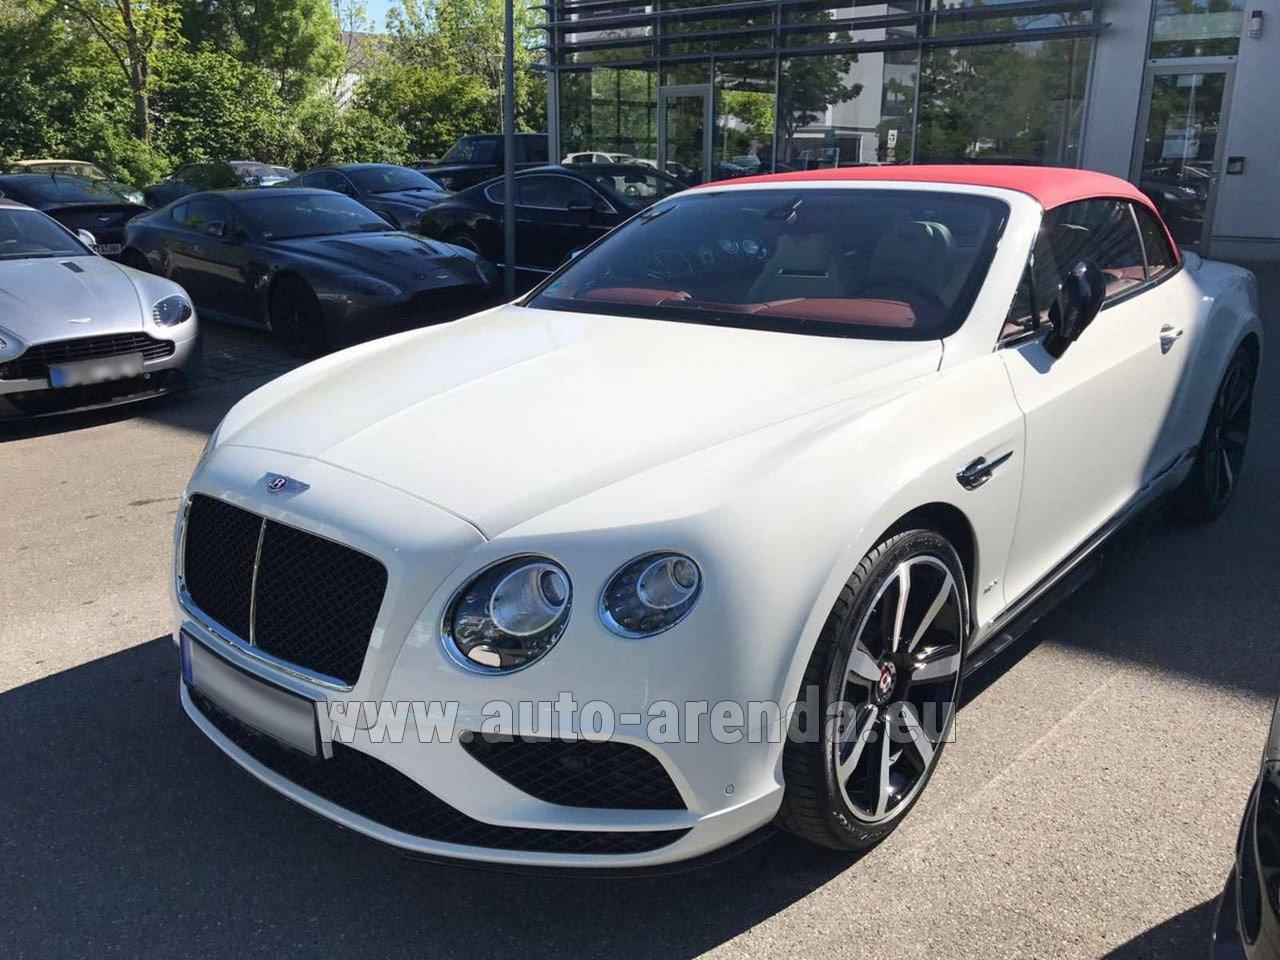 Rent The Bentley Continental Gtc V8 S Car In Belgium